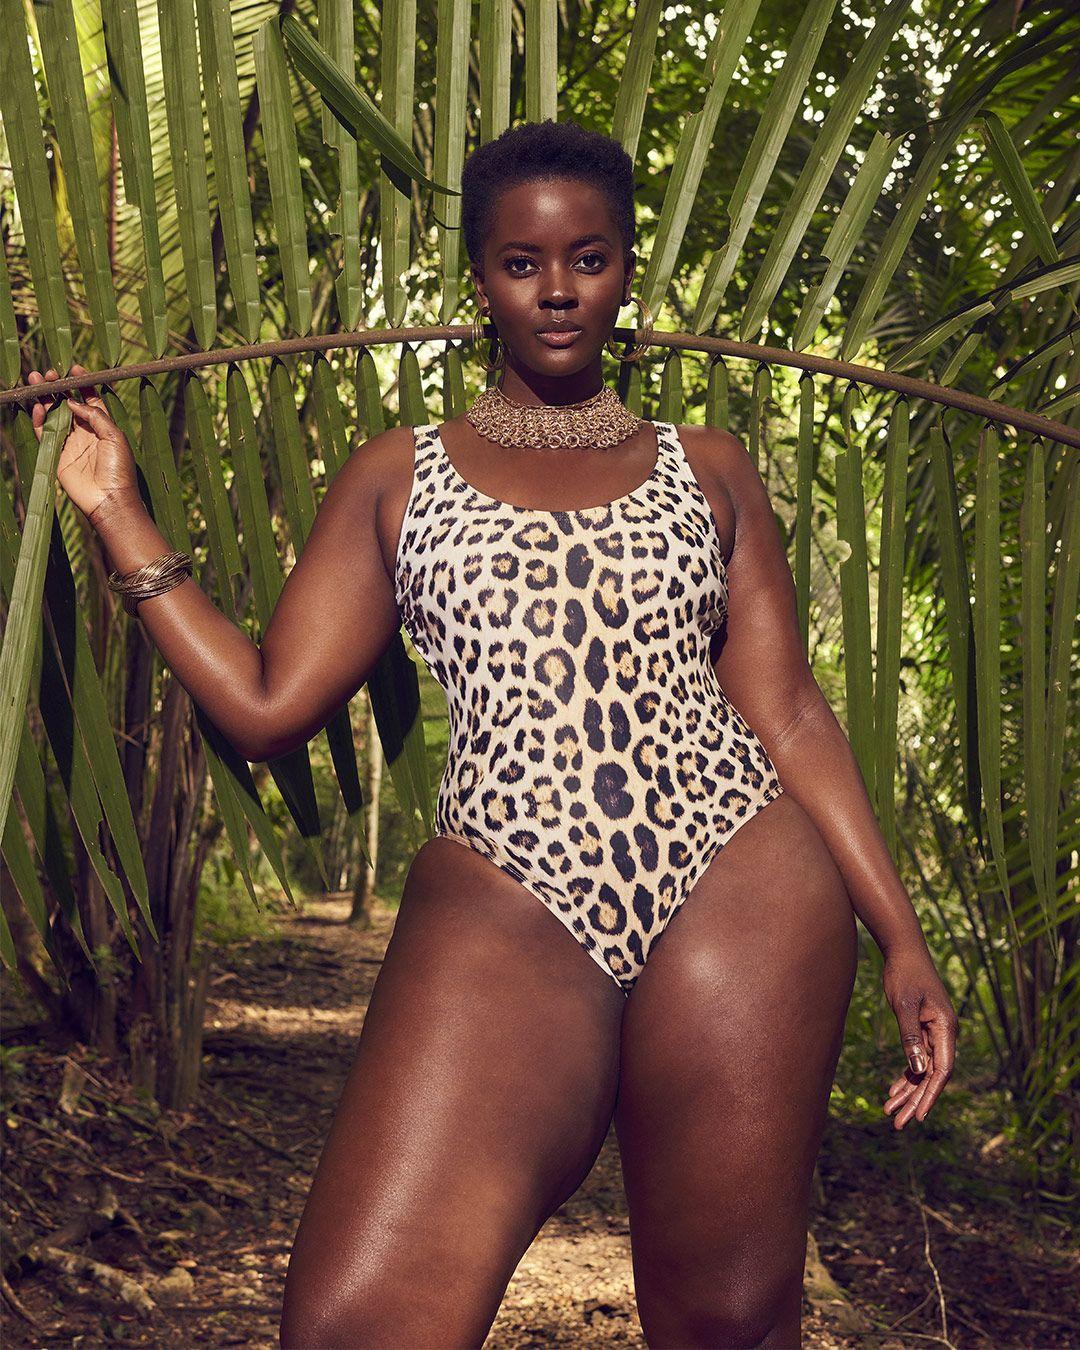 e094c48ae2a8 Philomena Kwao giving us her best power pose in the GabiFresh Savannah  Swimsuit.